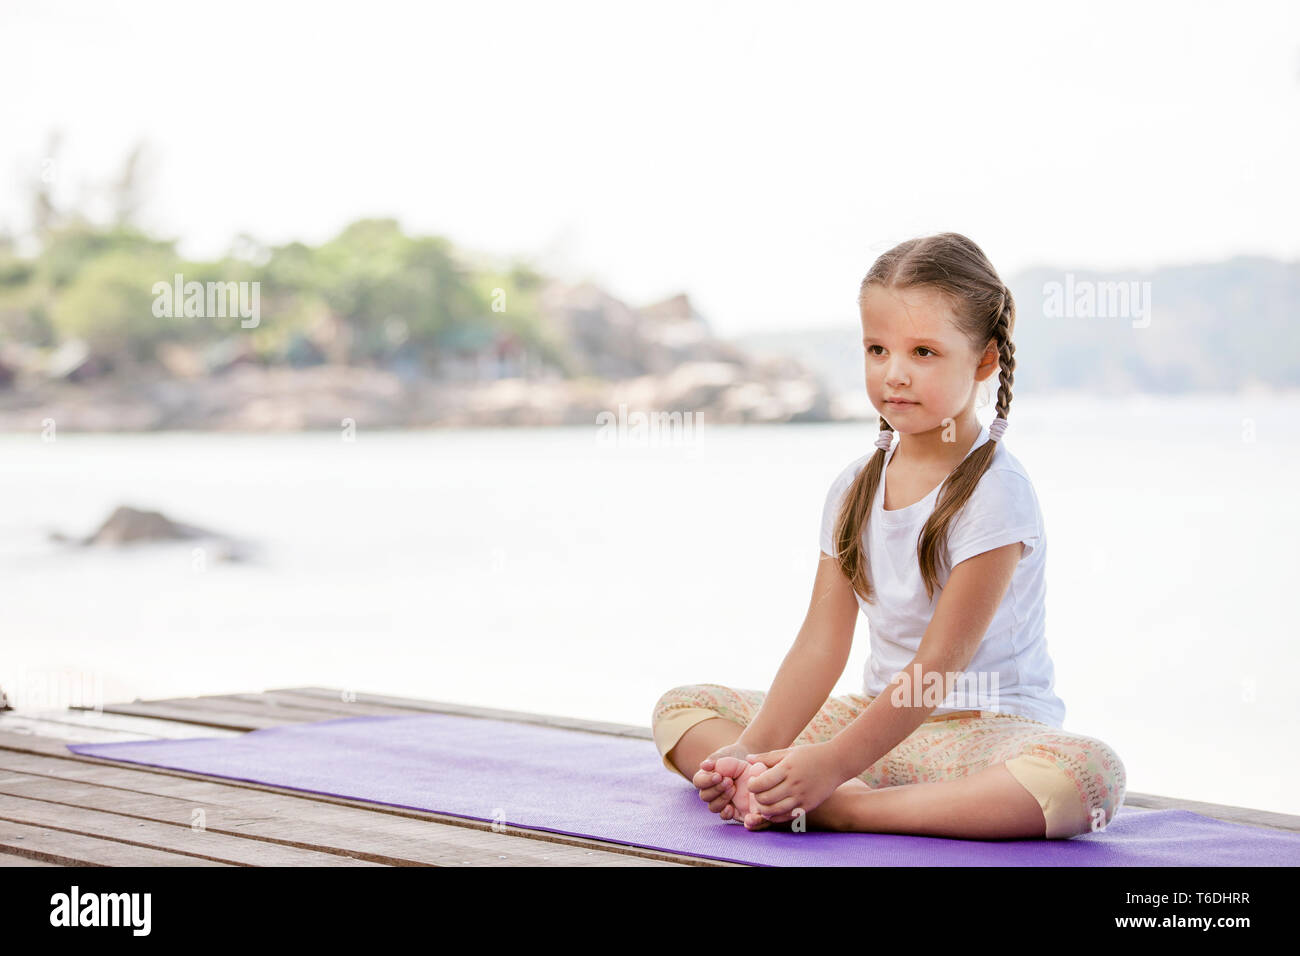 Child doing exercise on platform outdoors. Healthy lifestyle. Yoga girl - Stock Image